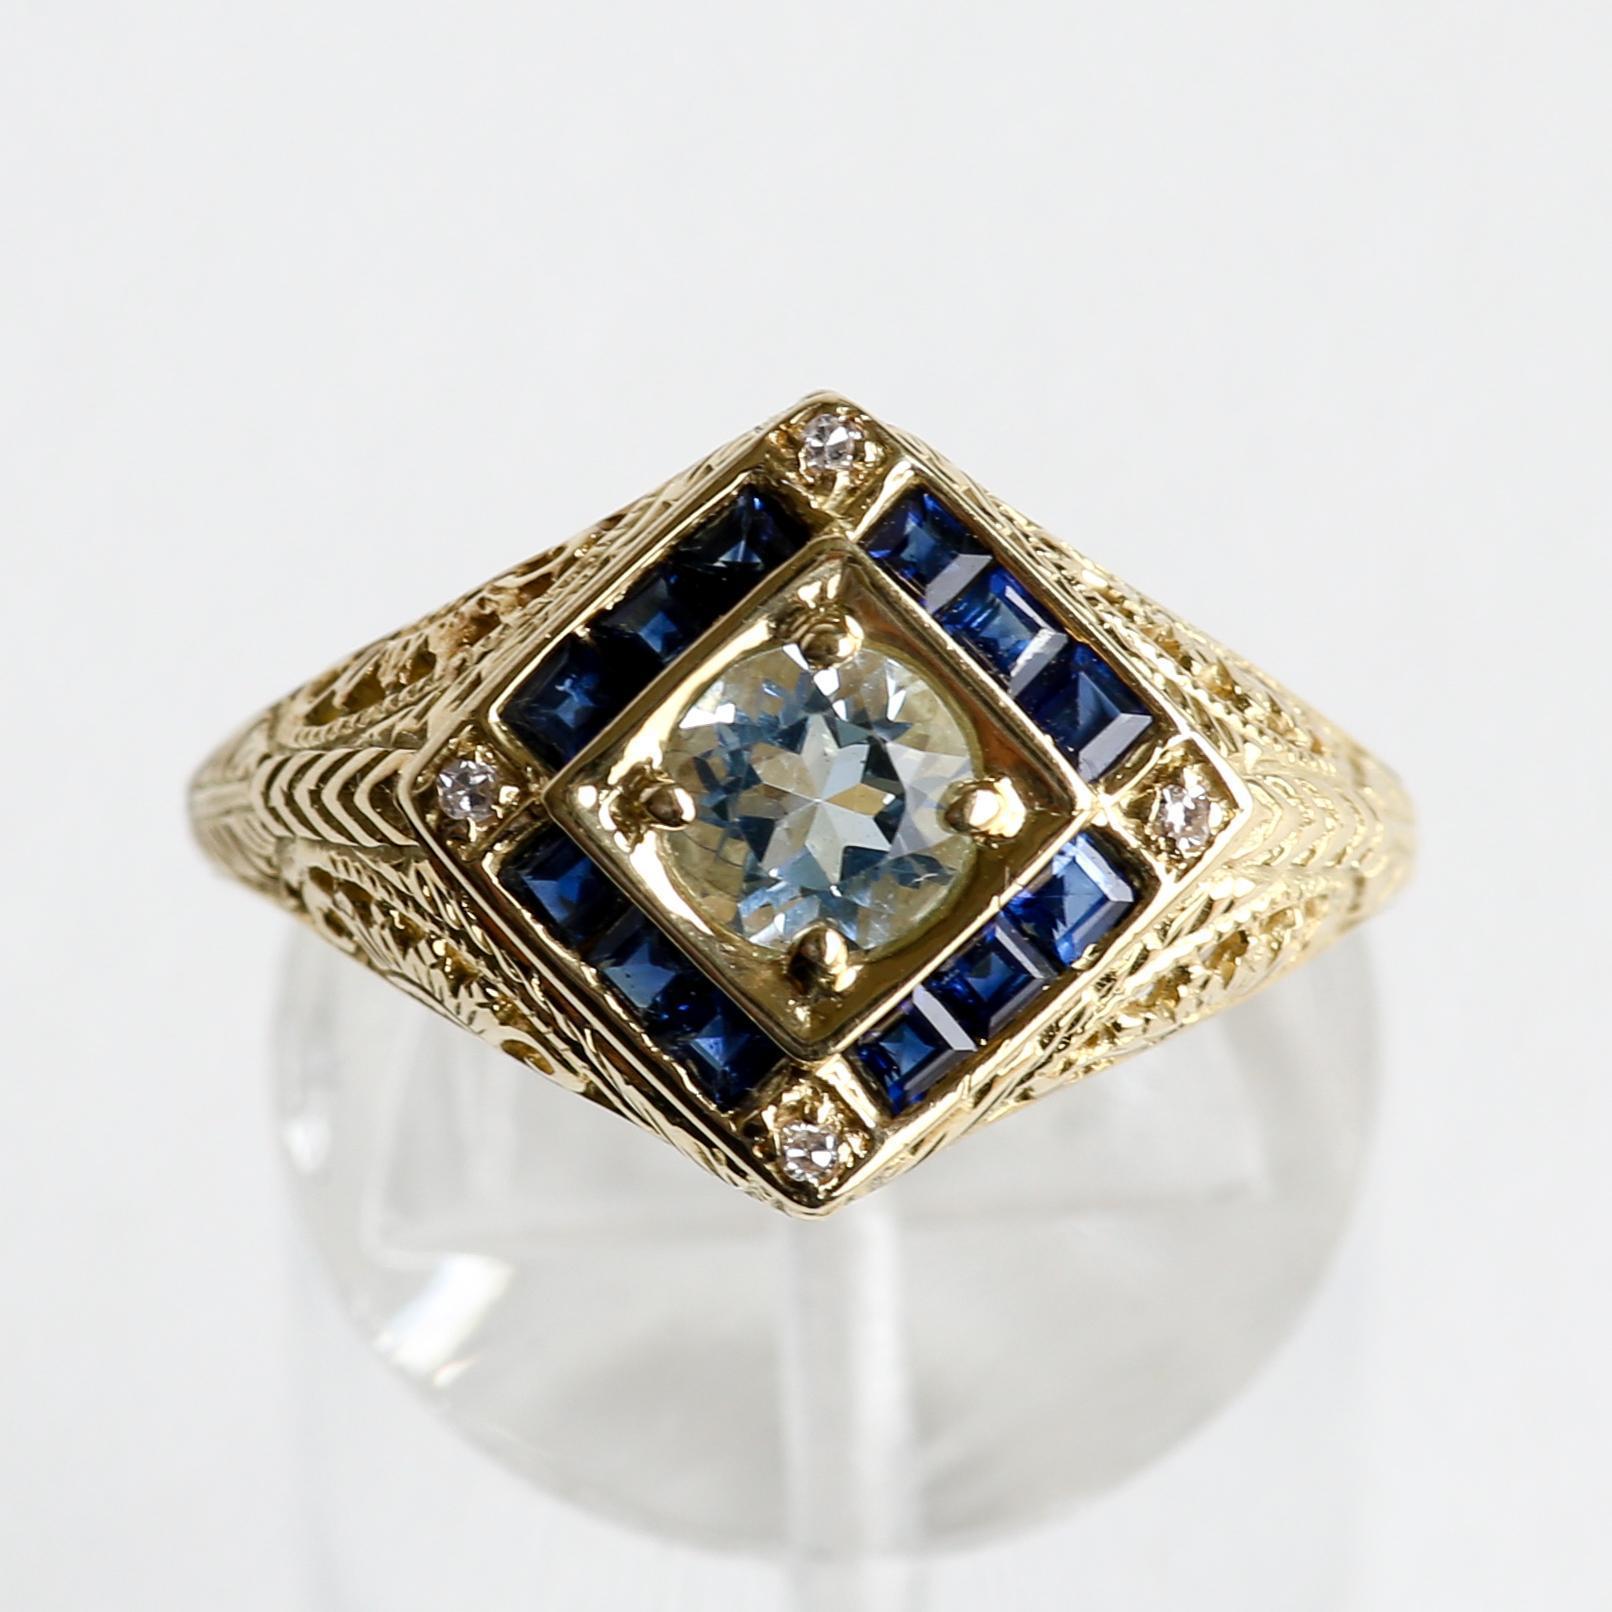 Lady's Circa 1910 Antique 14K Aquamarine, Sapphire & Diamond Ring